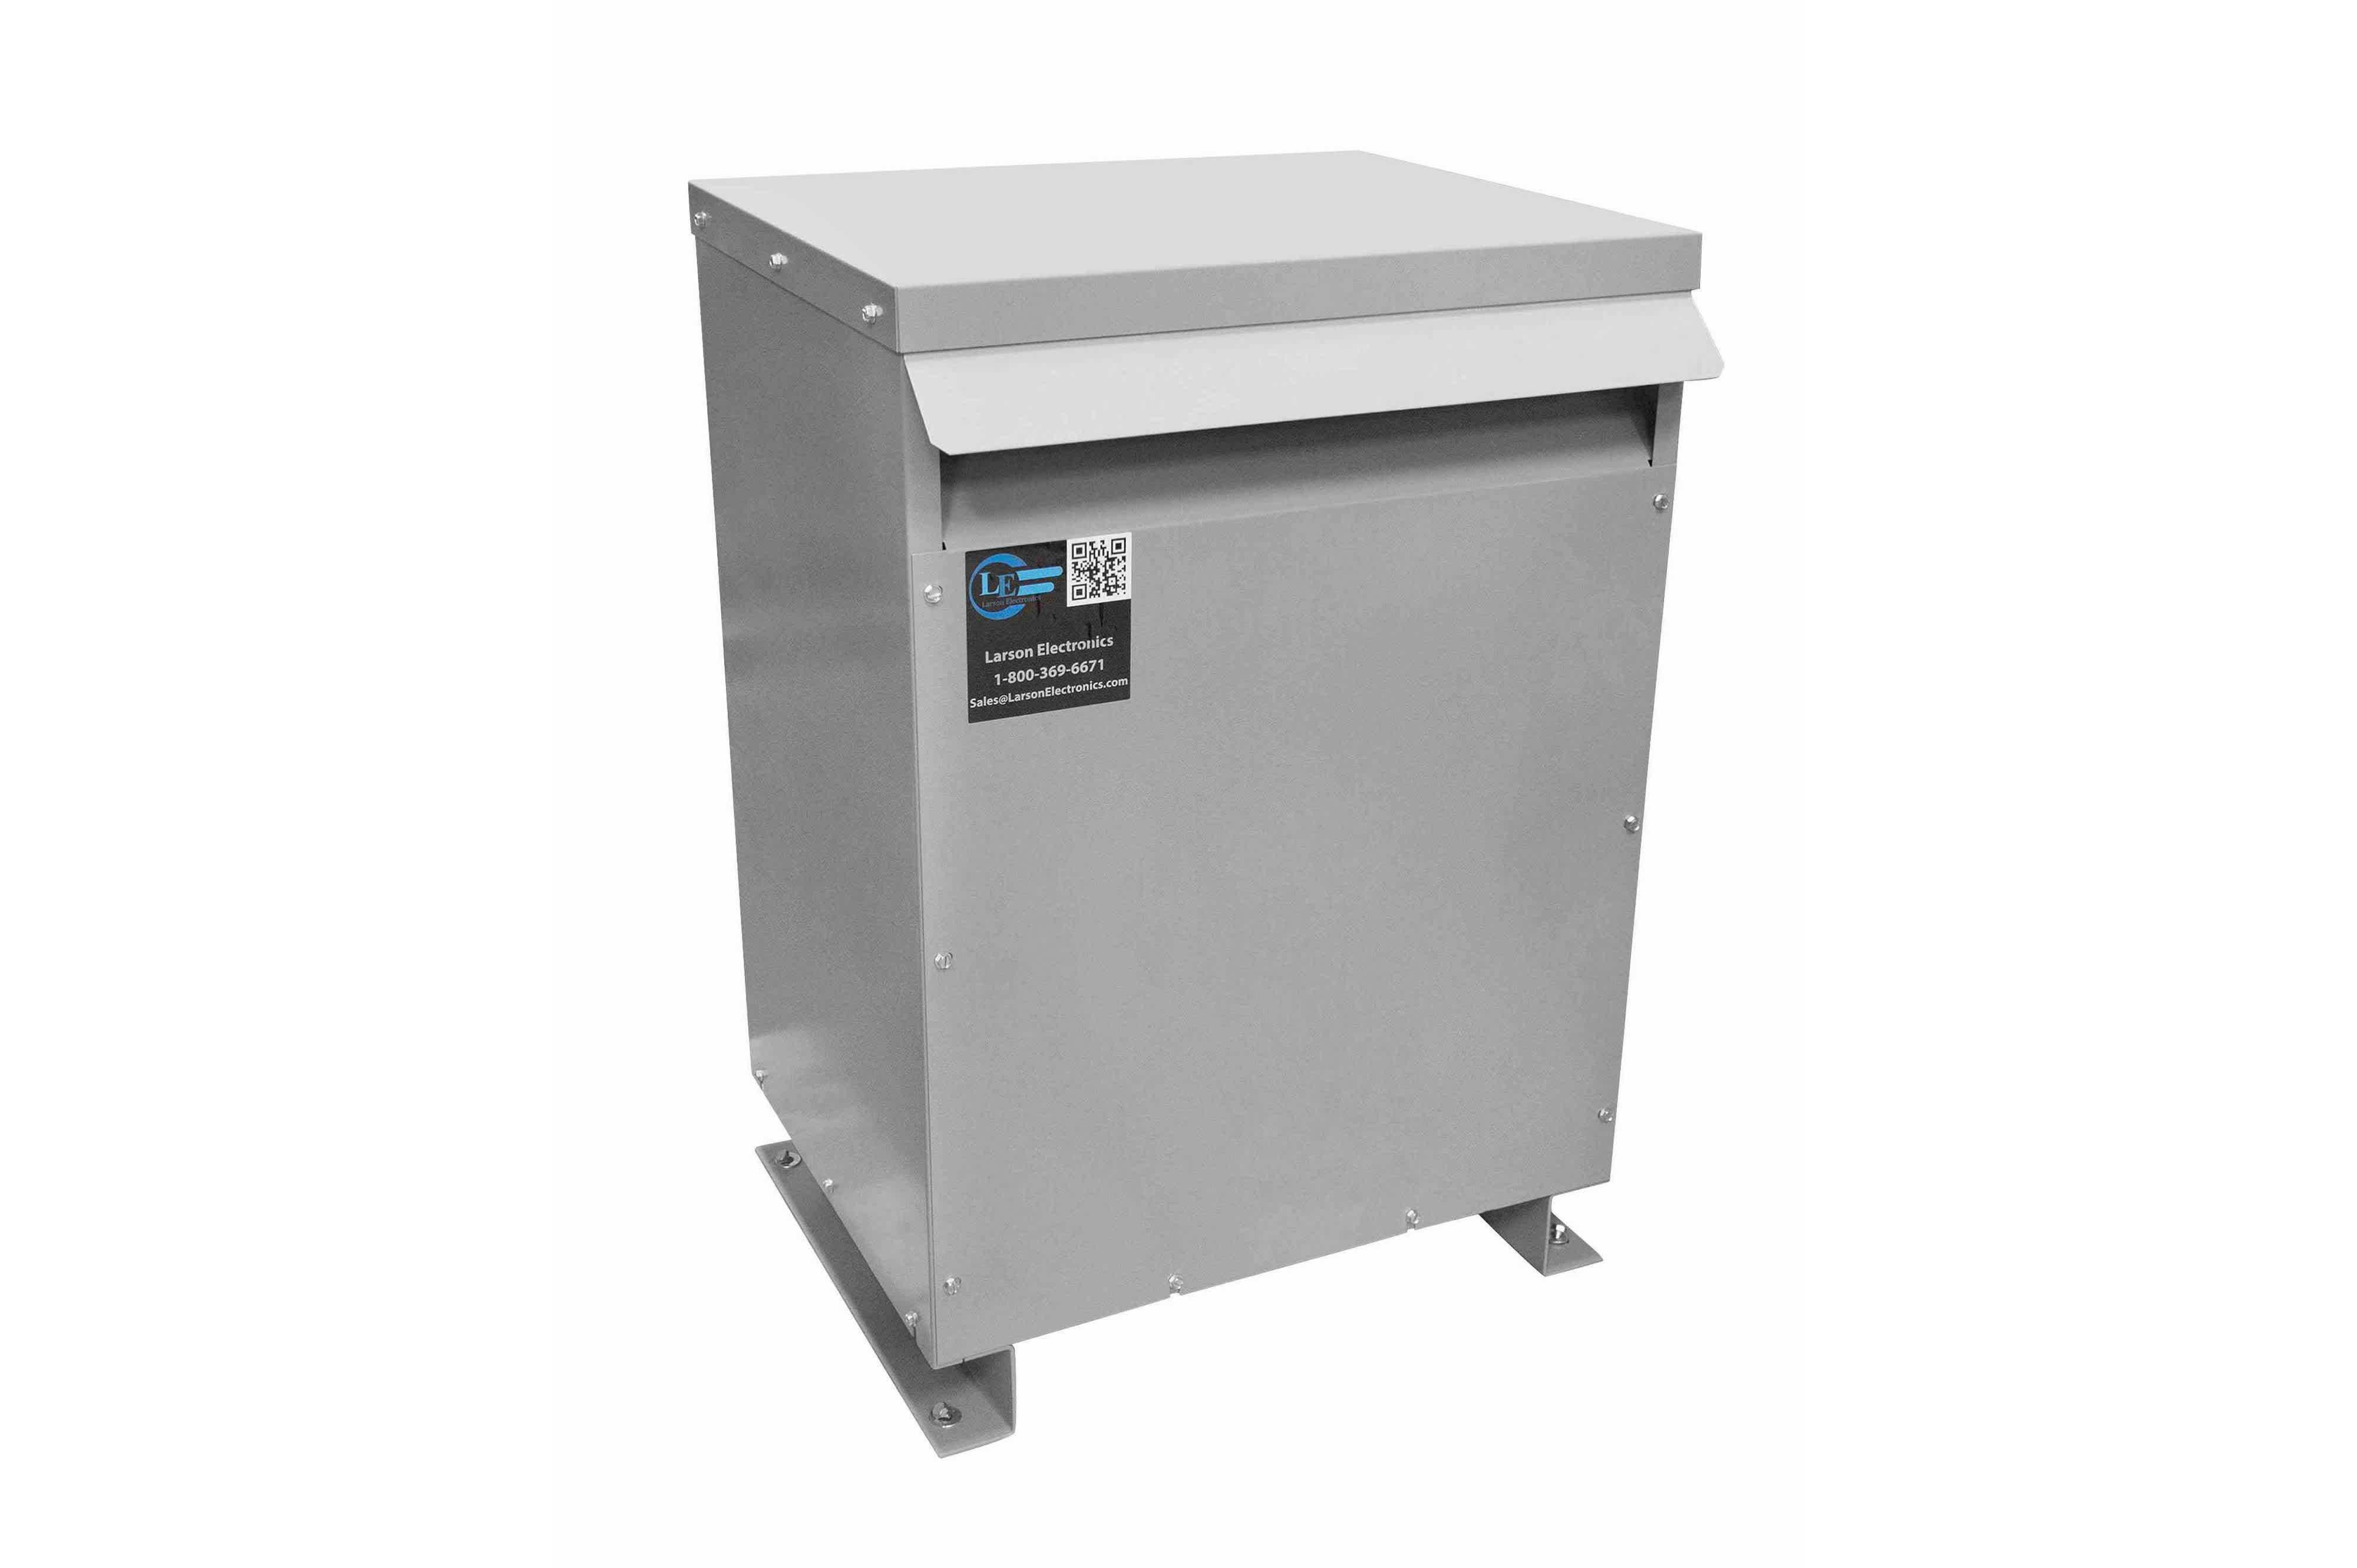 125 kVA 3PH Isolation Transformer, 240V Wye Primary, 400V Delta Secondary, N3R, Ventilated, 60 Hz